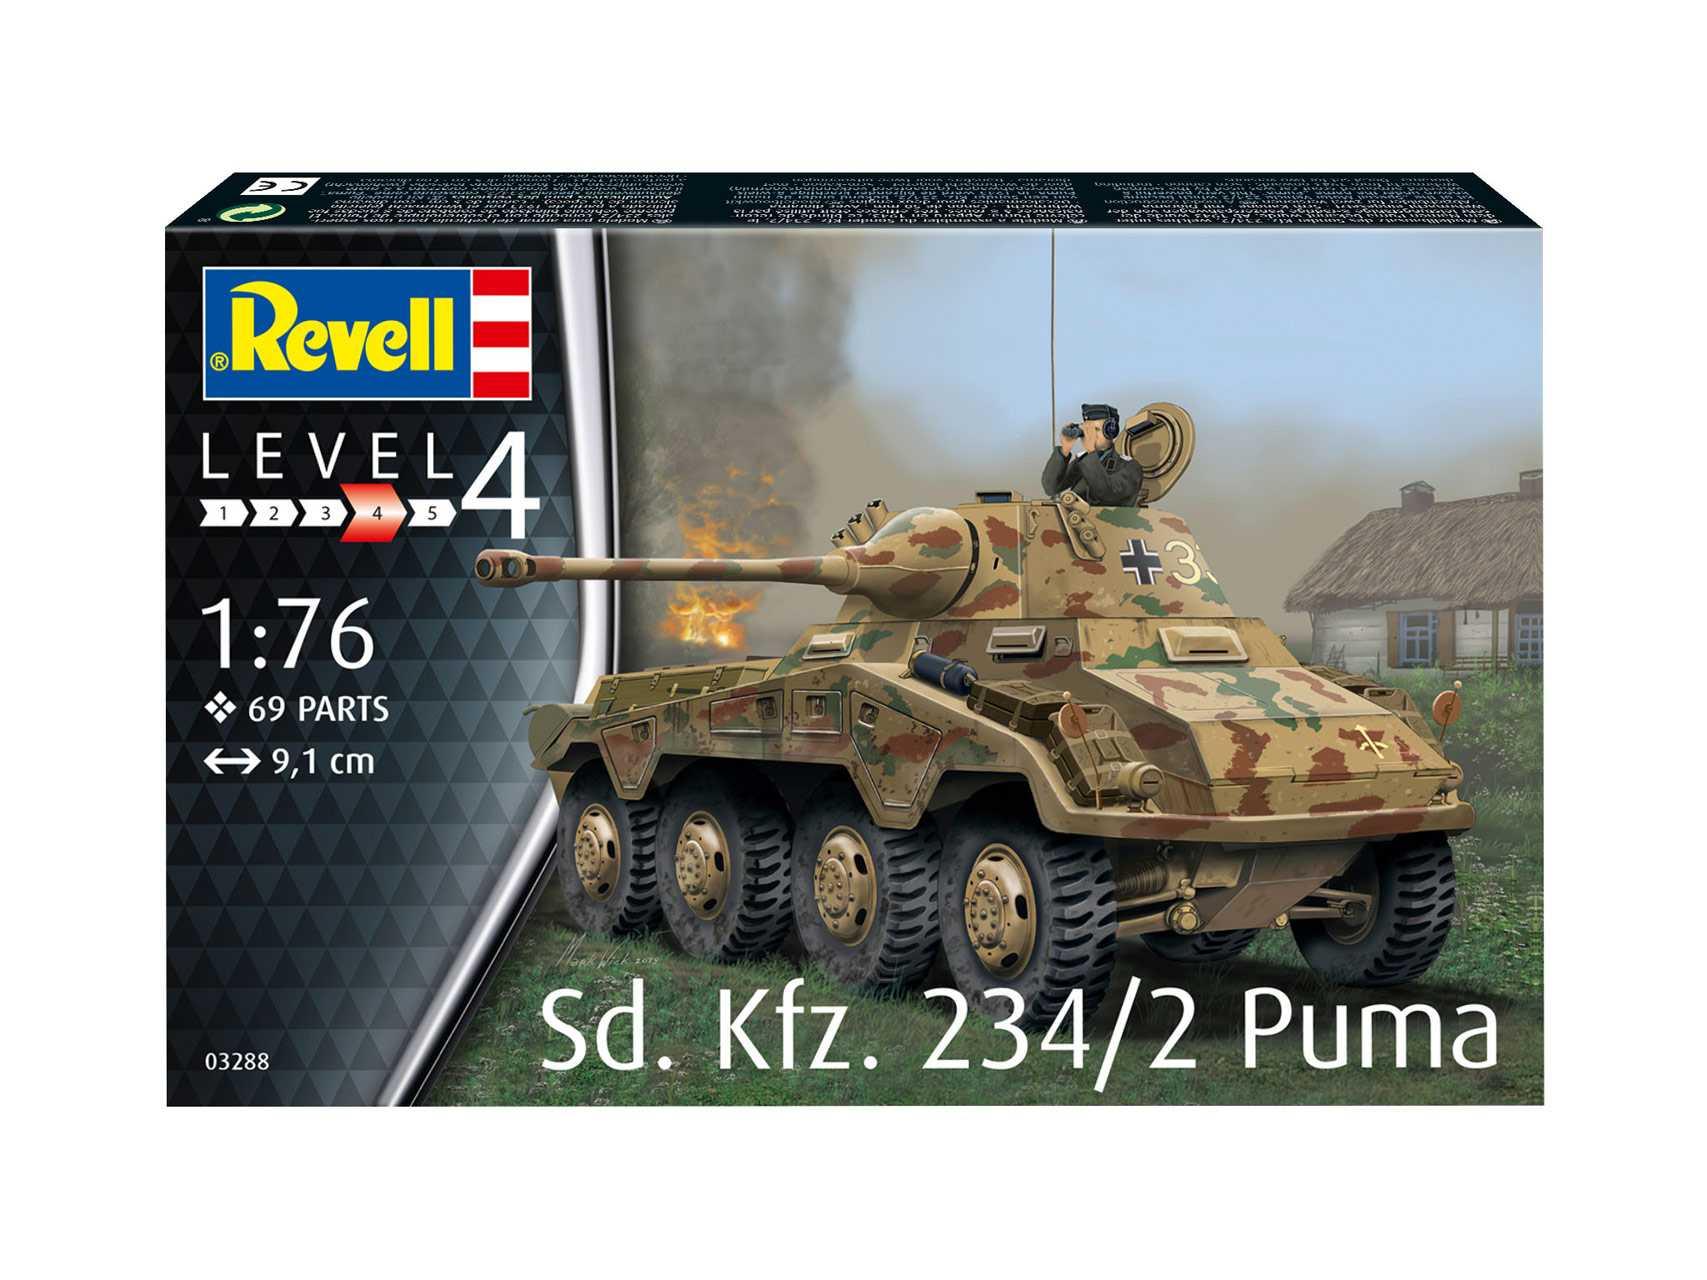 1:76 Sd.Kfz. 234/2 Puma